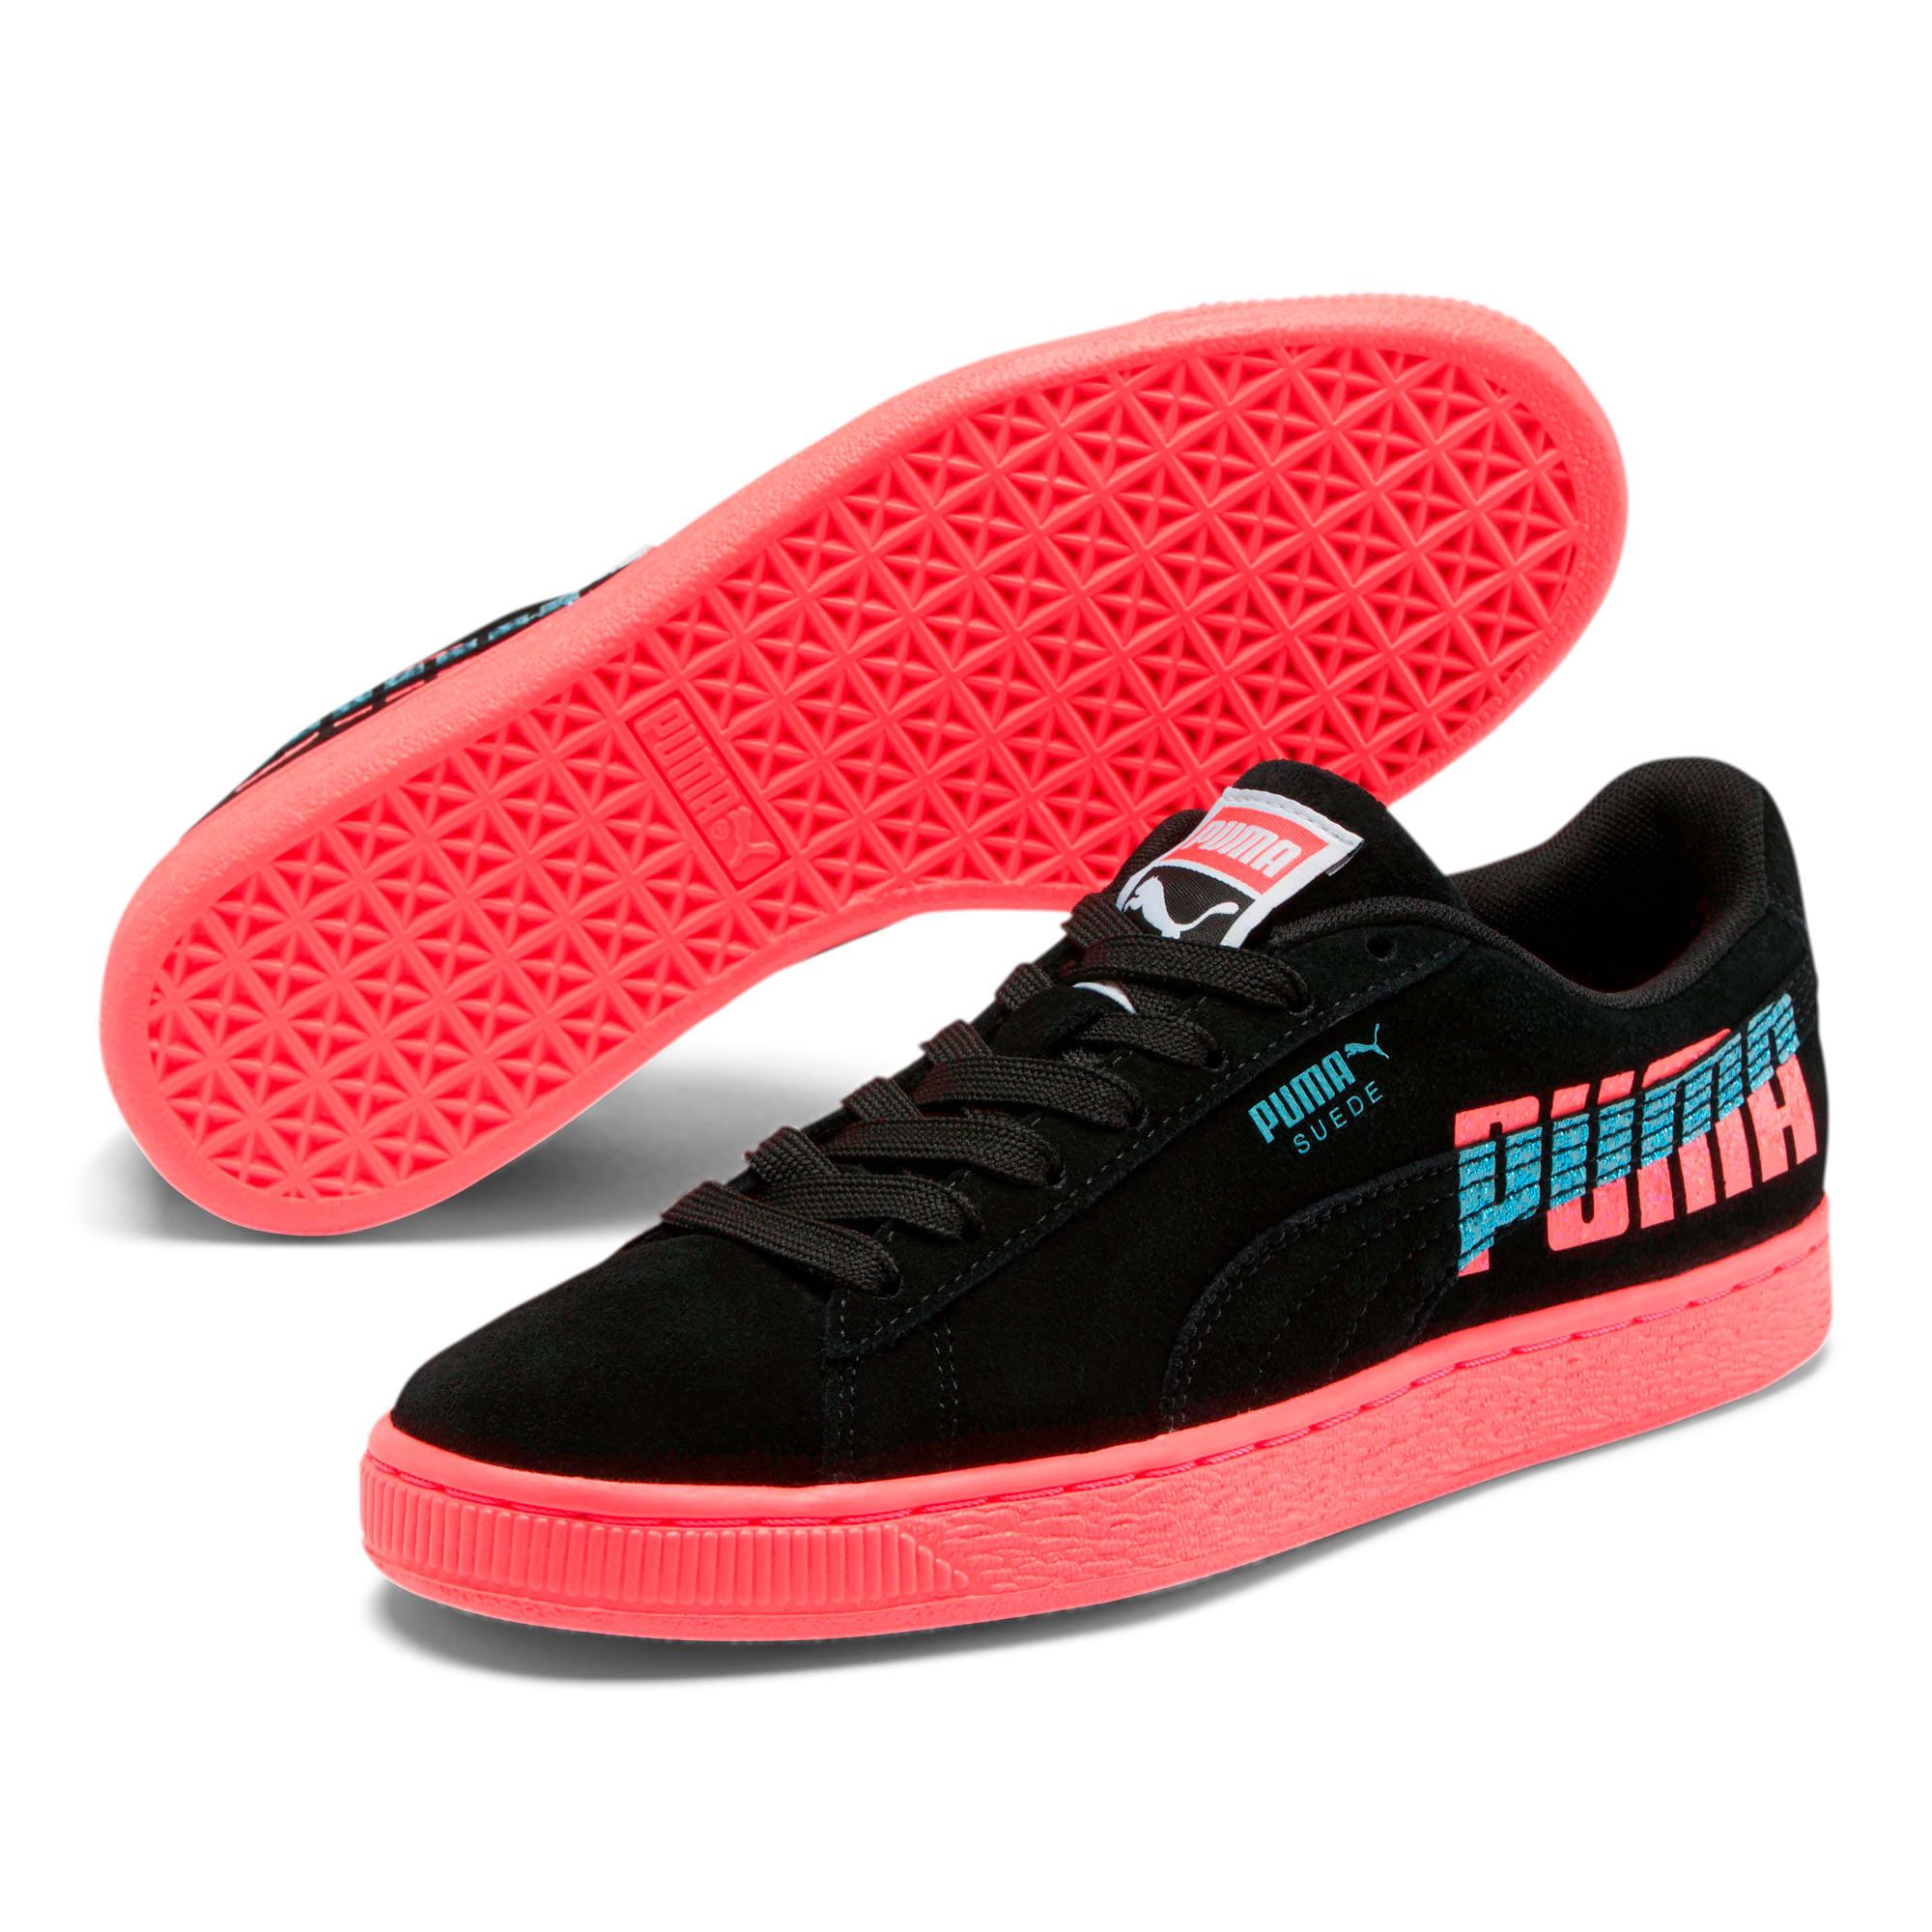 Thumbnail 2 of Suede Classic Glitz Women's Sneakers, Pink Alert-Puma Black, medium